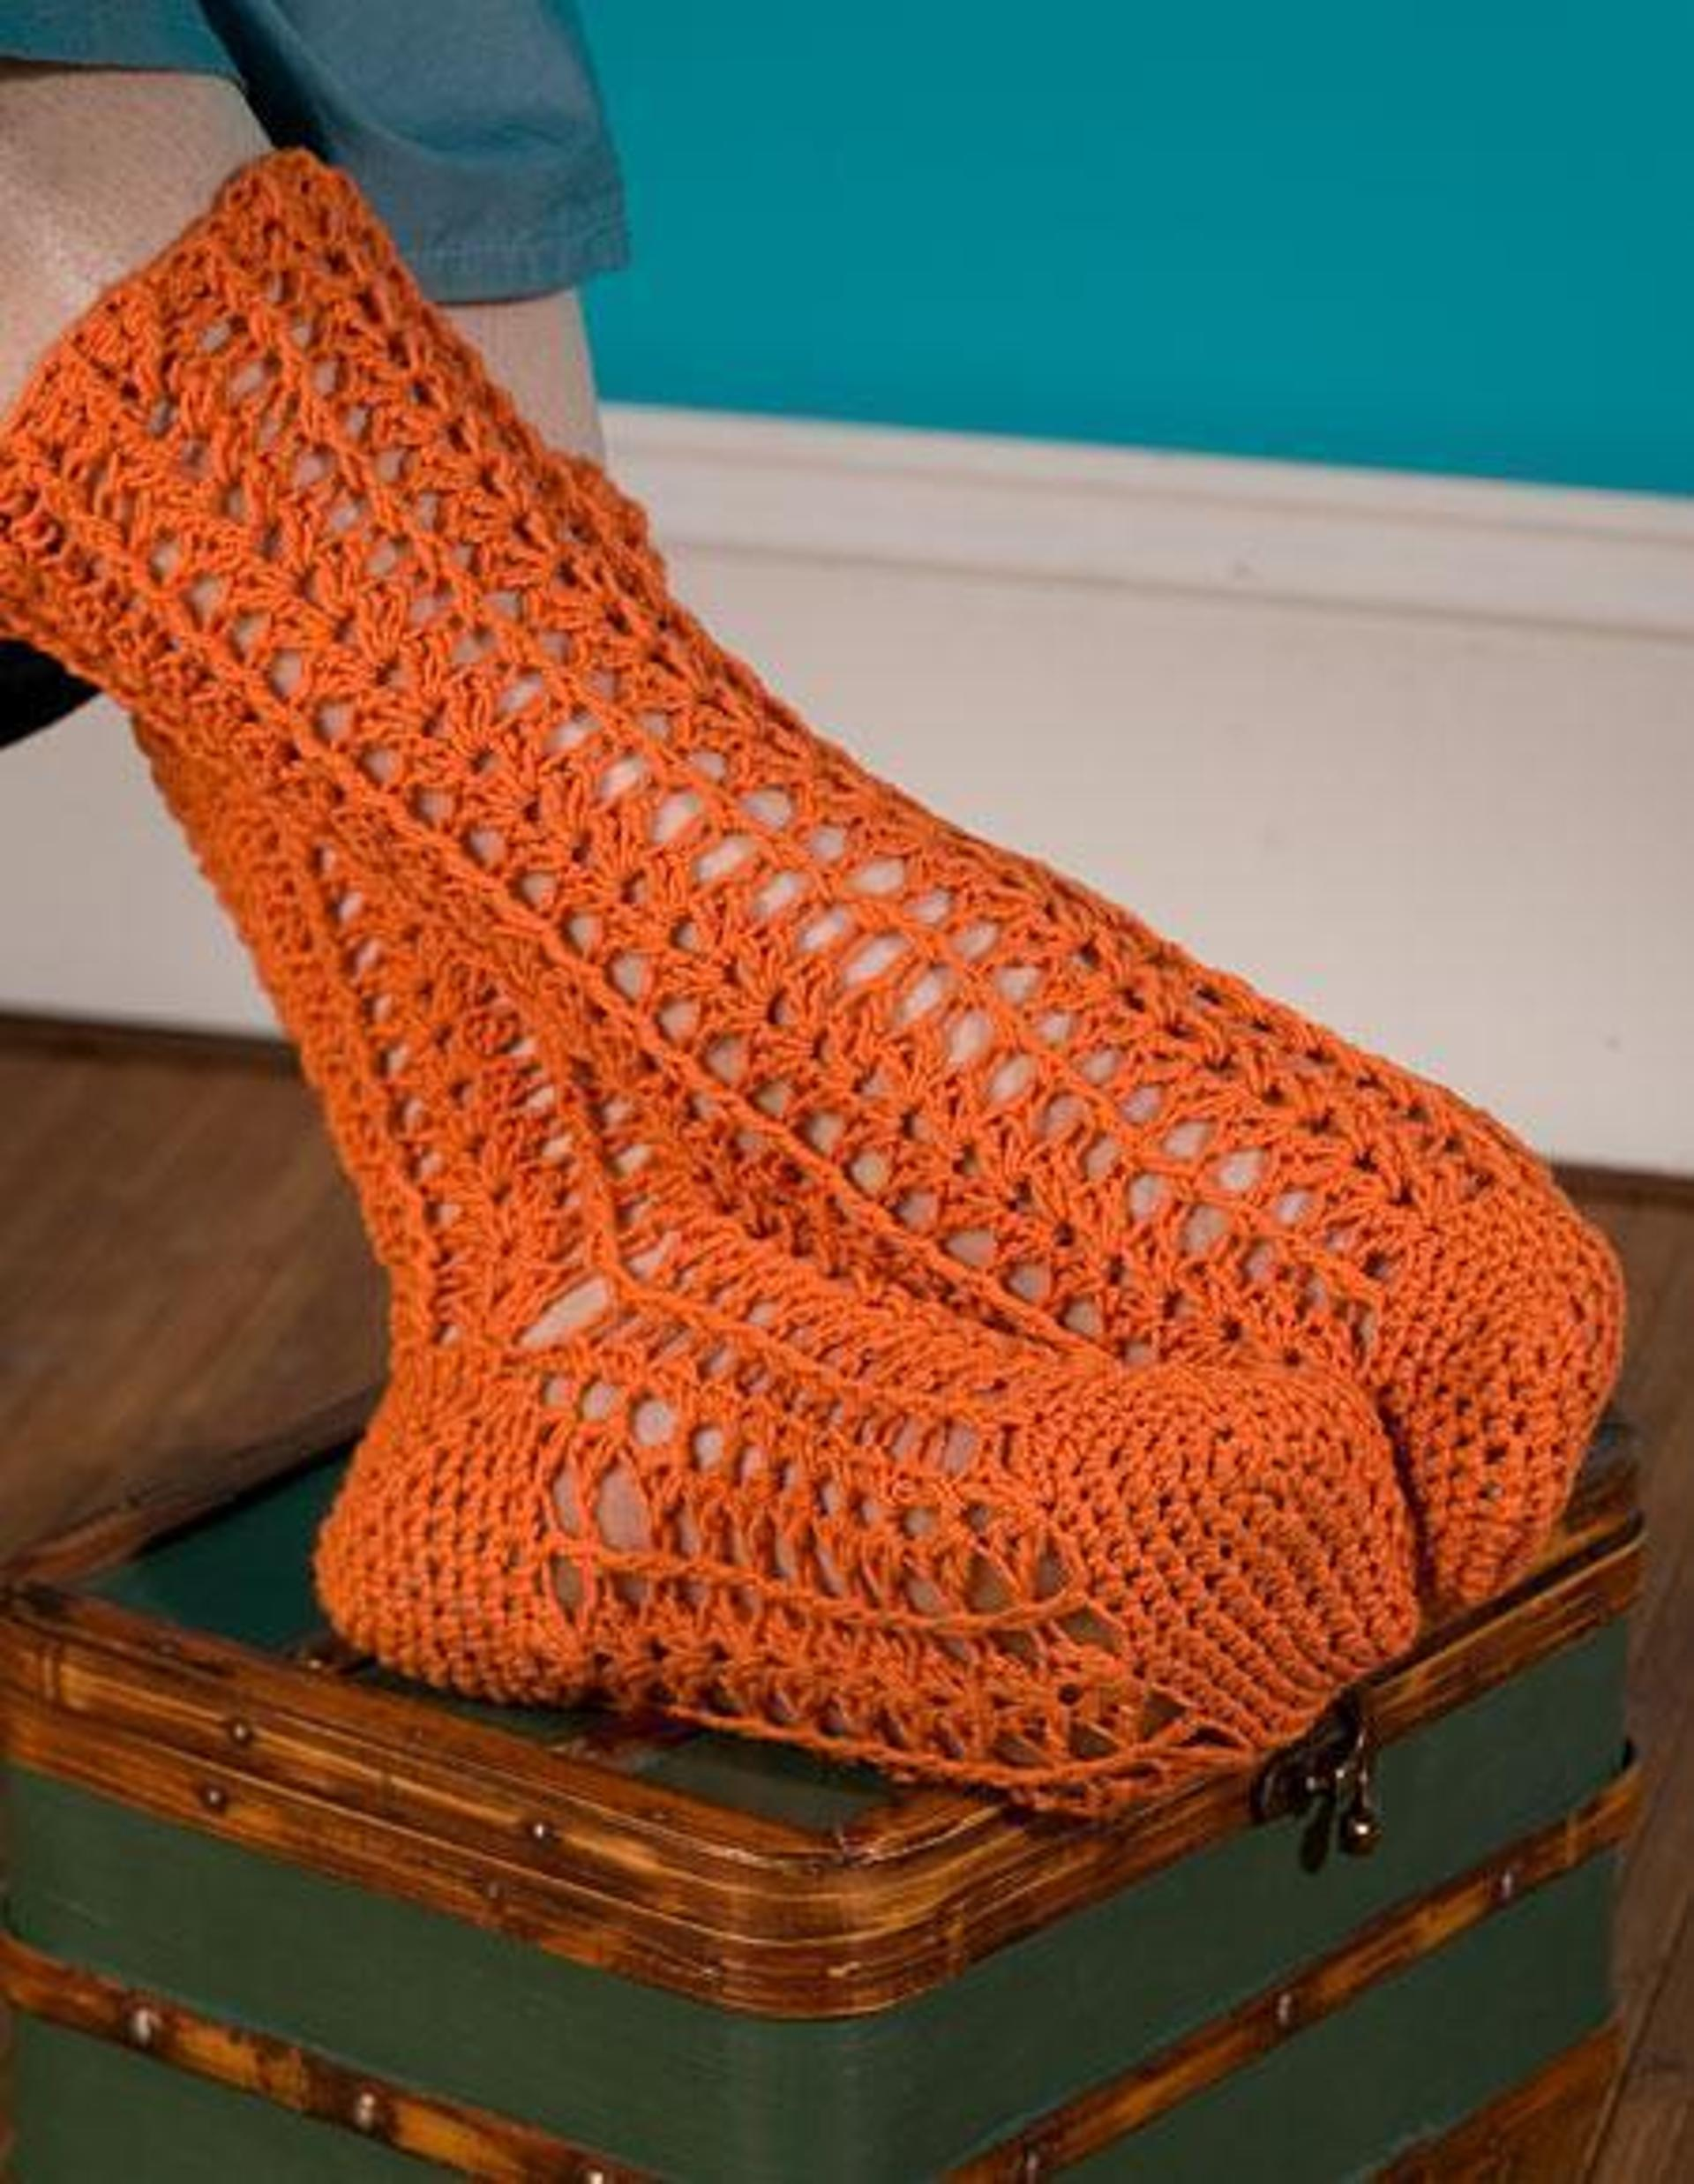 durango crochet socks pattern